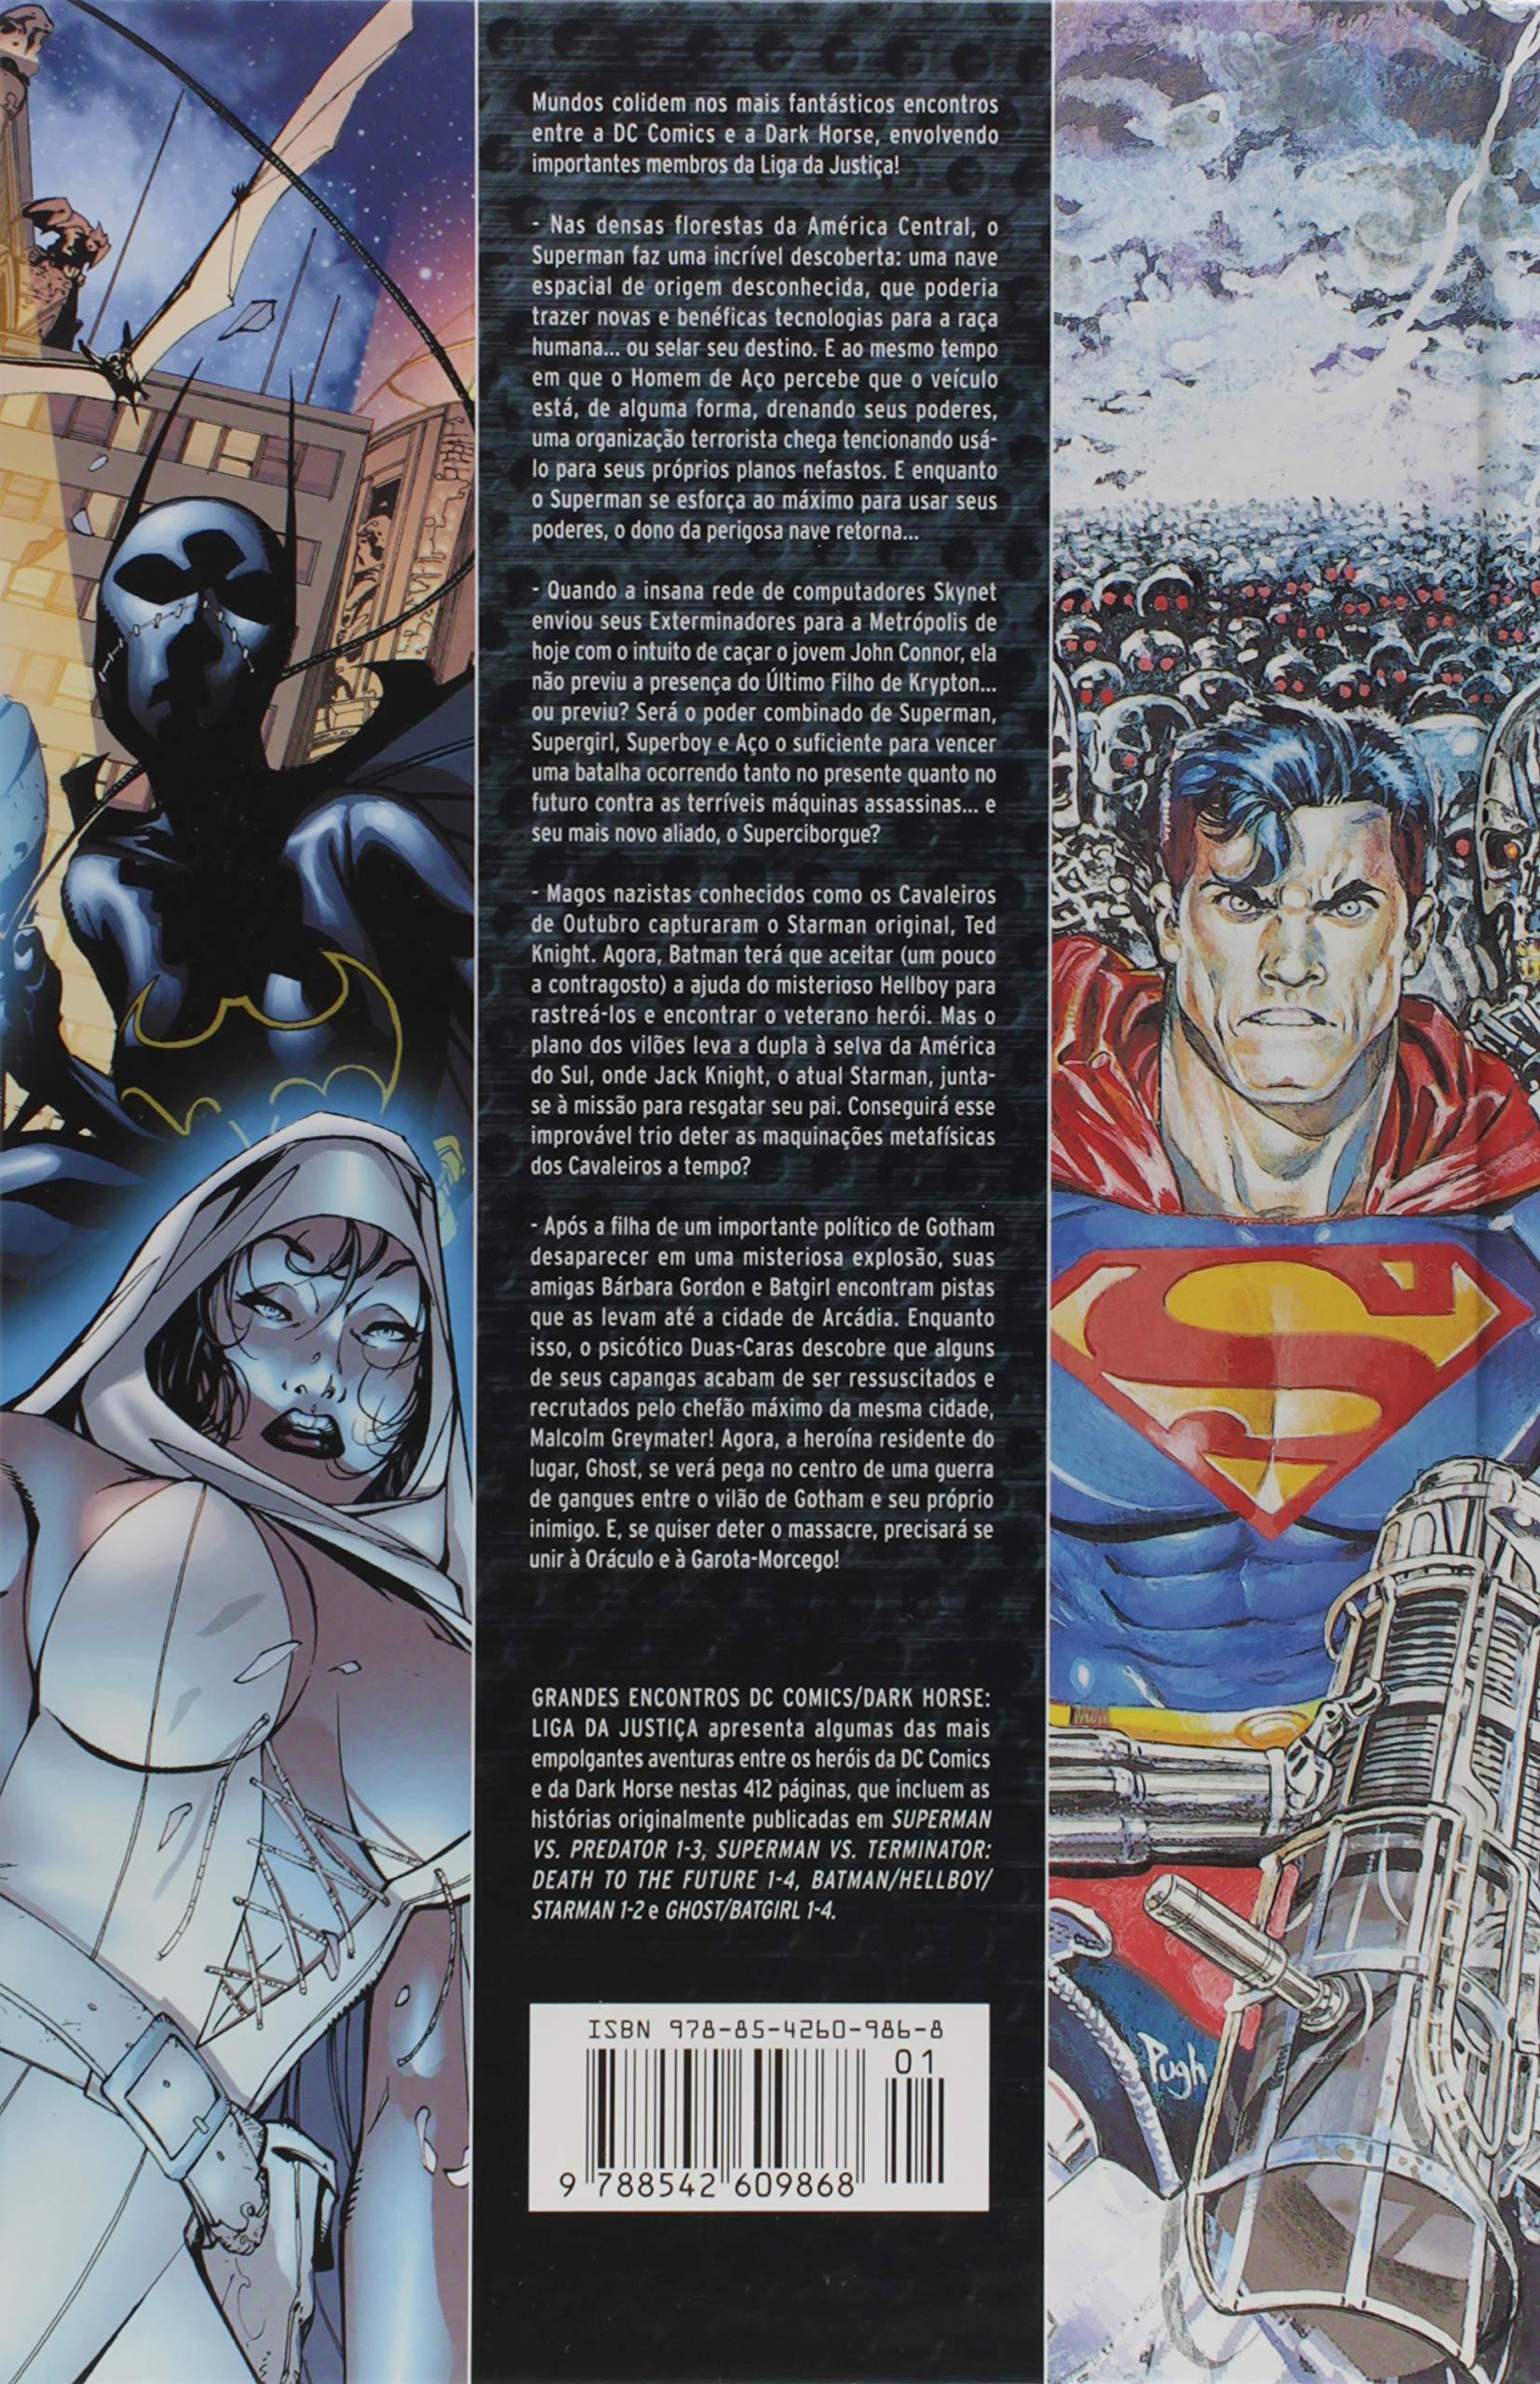 129da9b11c8 Grandes Encontros. DC Comics. Dark Horse . Liga da Justiça - Volume 1 -  9788542609868 - Livros na Amazon Brasil